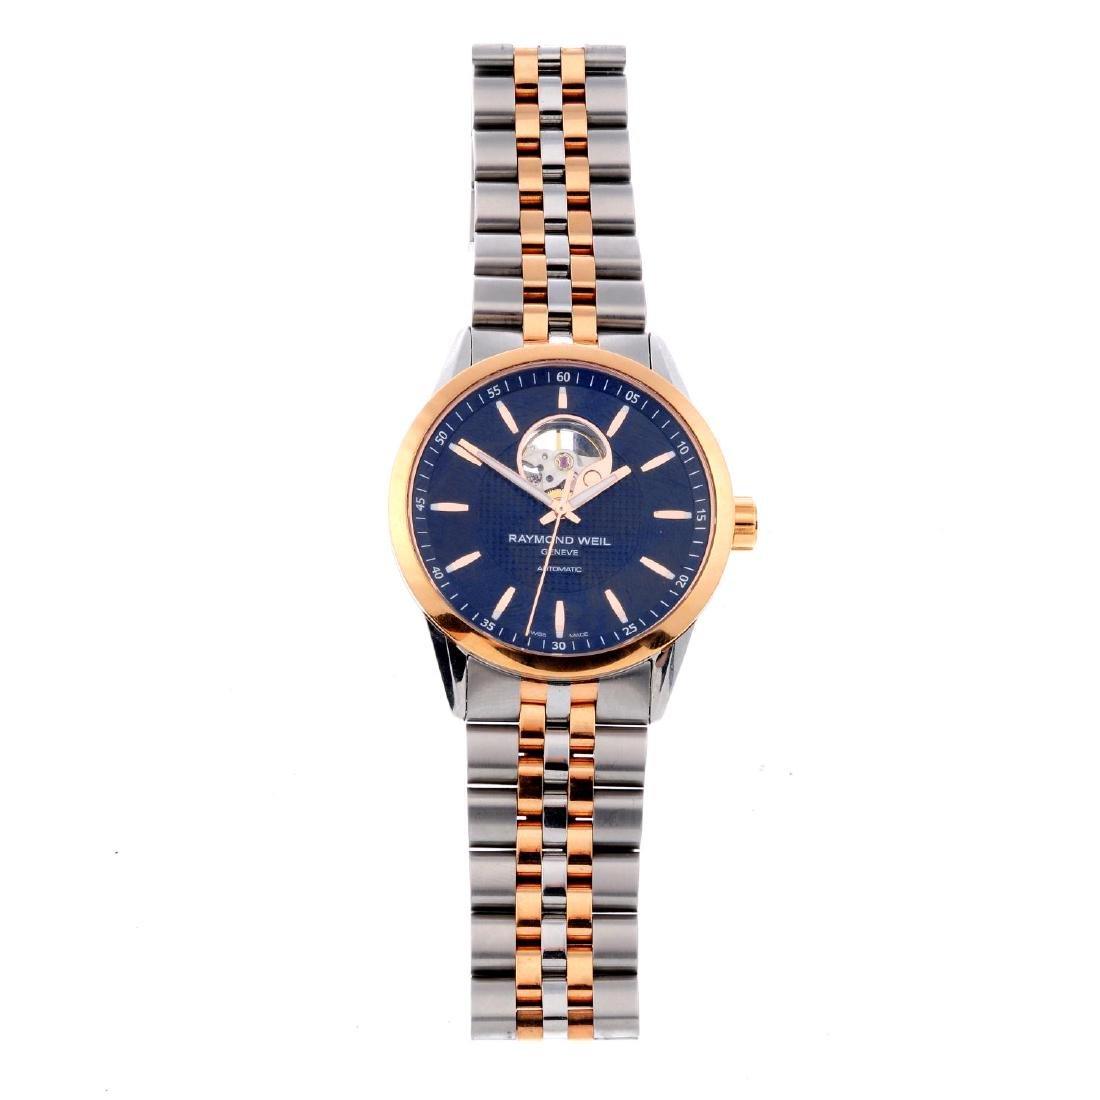 RAYMOND WEIL - a gentleman's Freelancer bracelet watch.